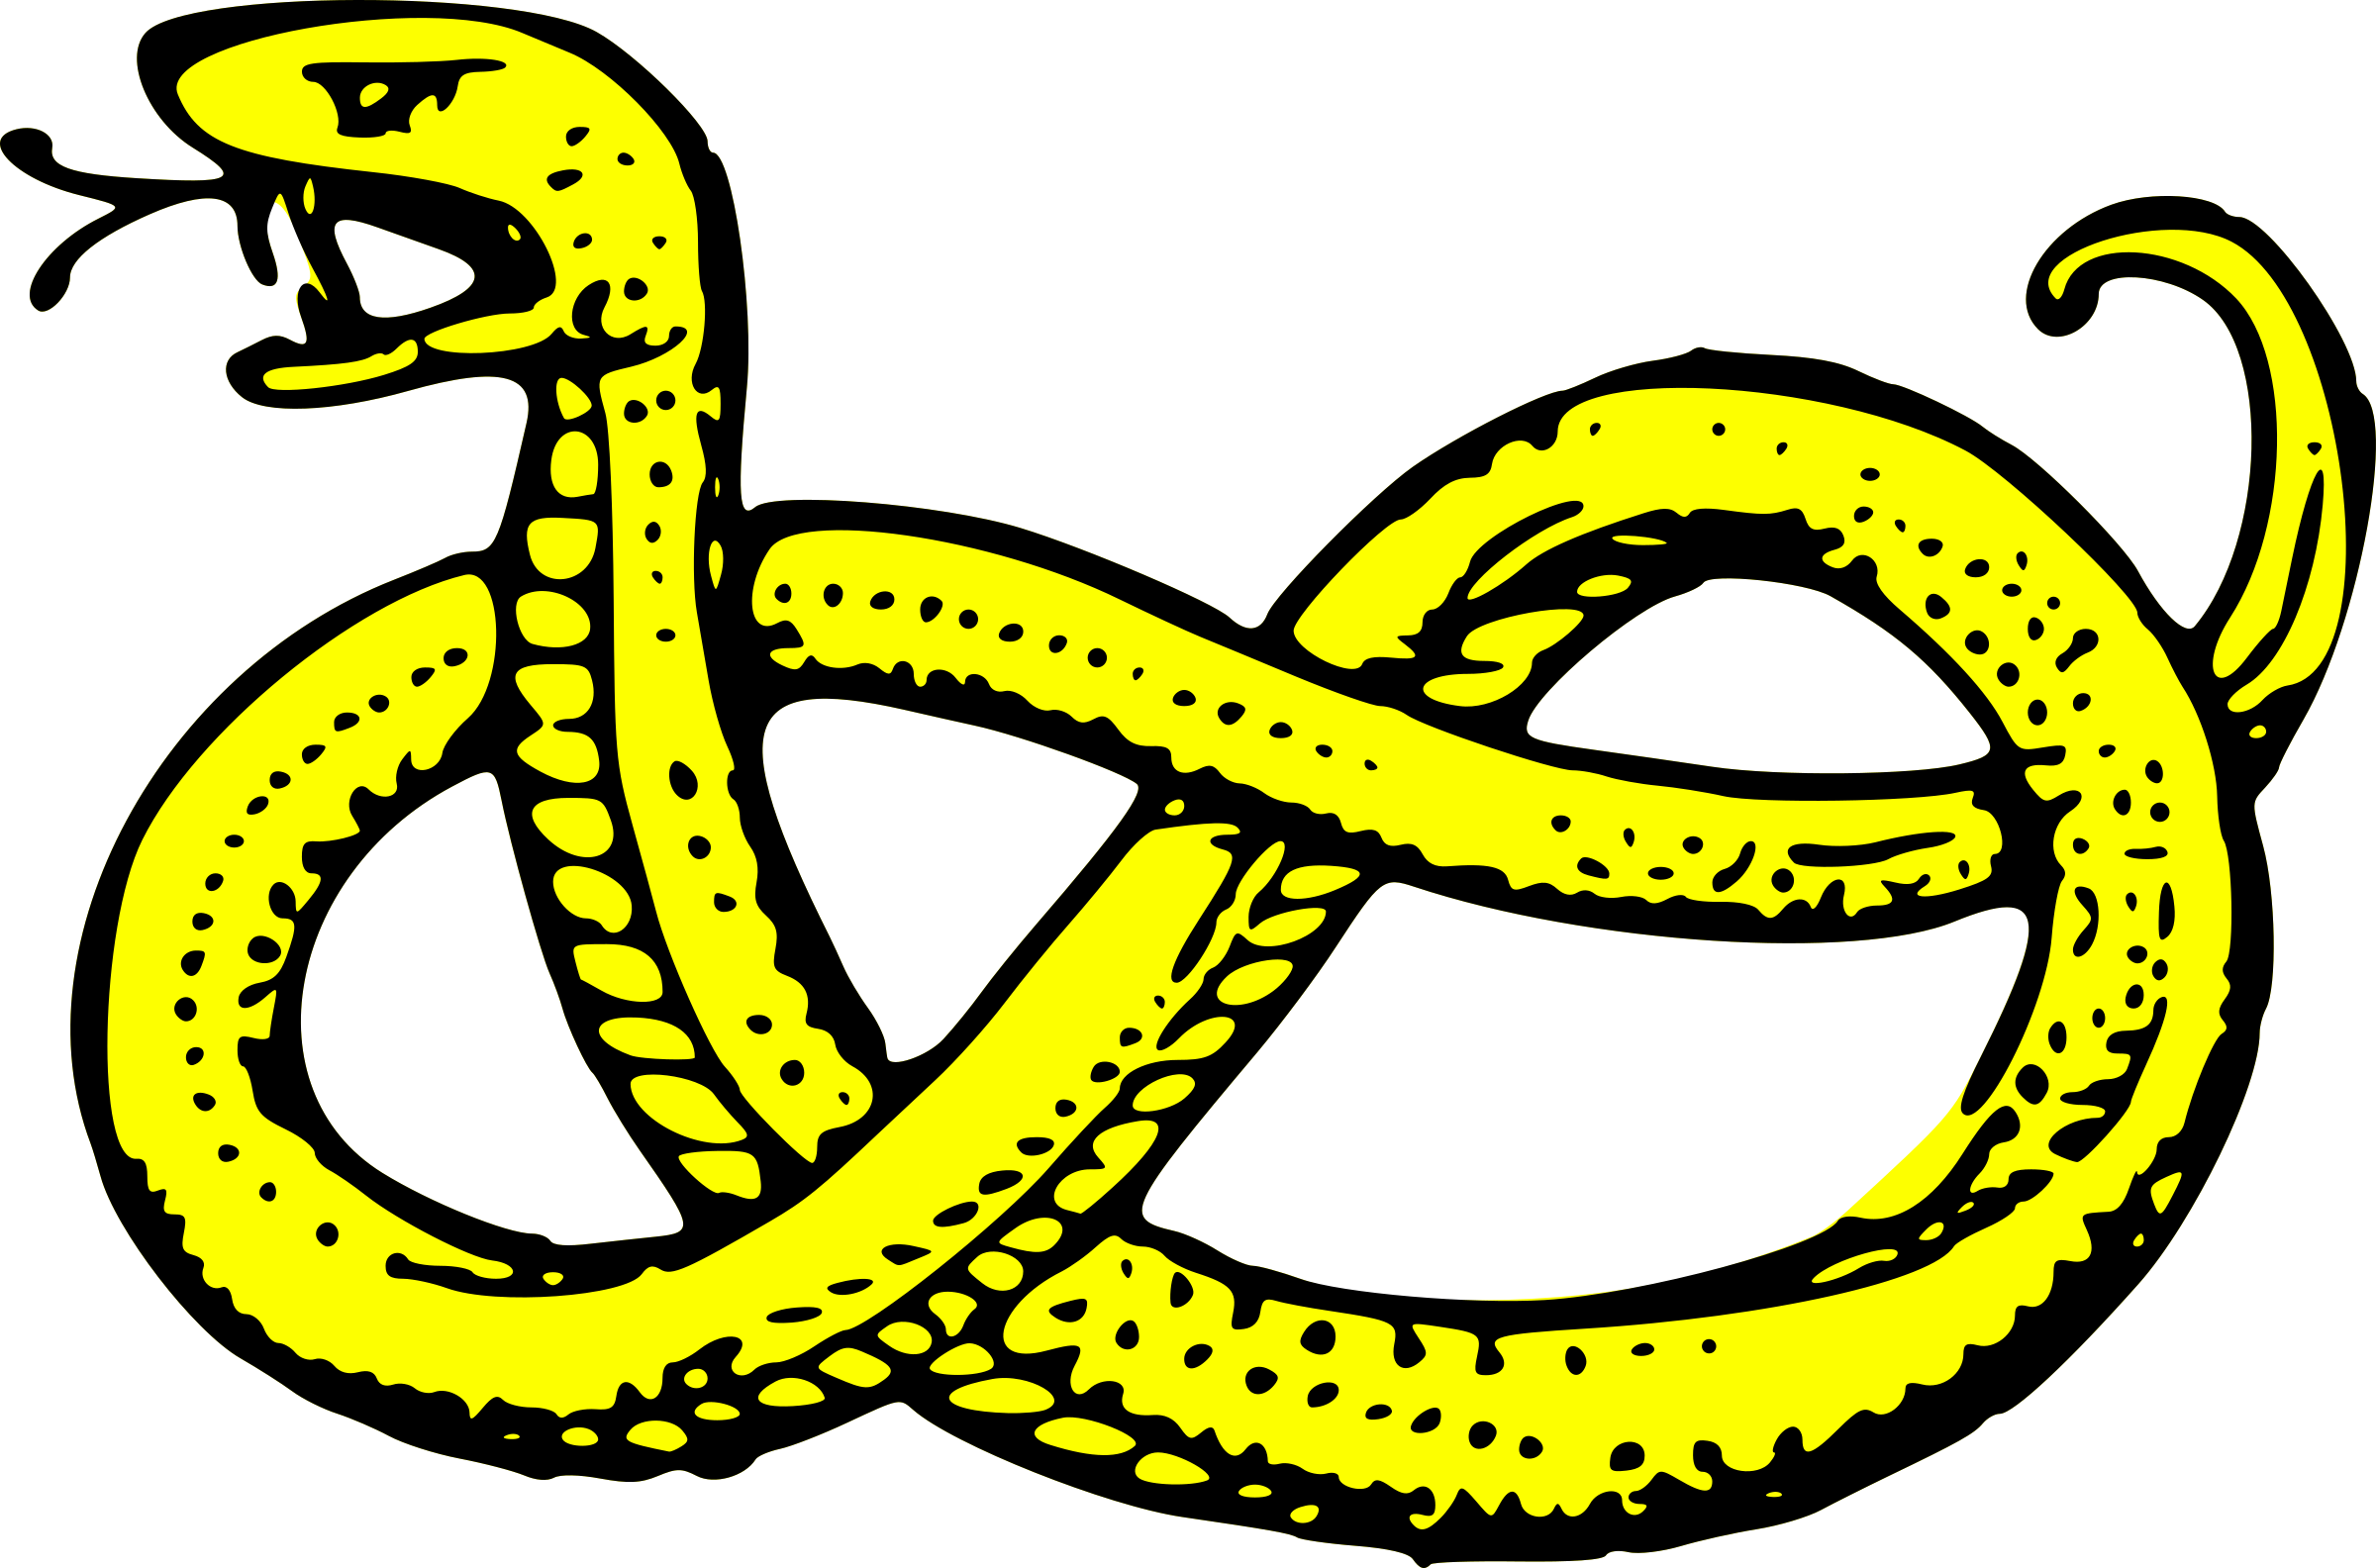 Snake eyes animal crazywidow. Clipart eye cobra